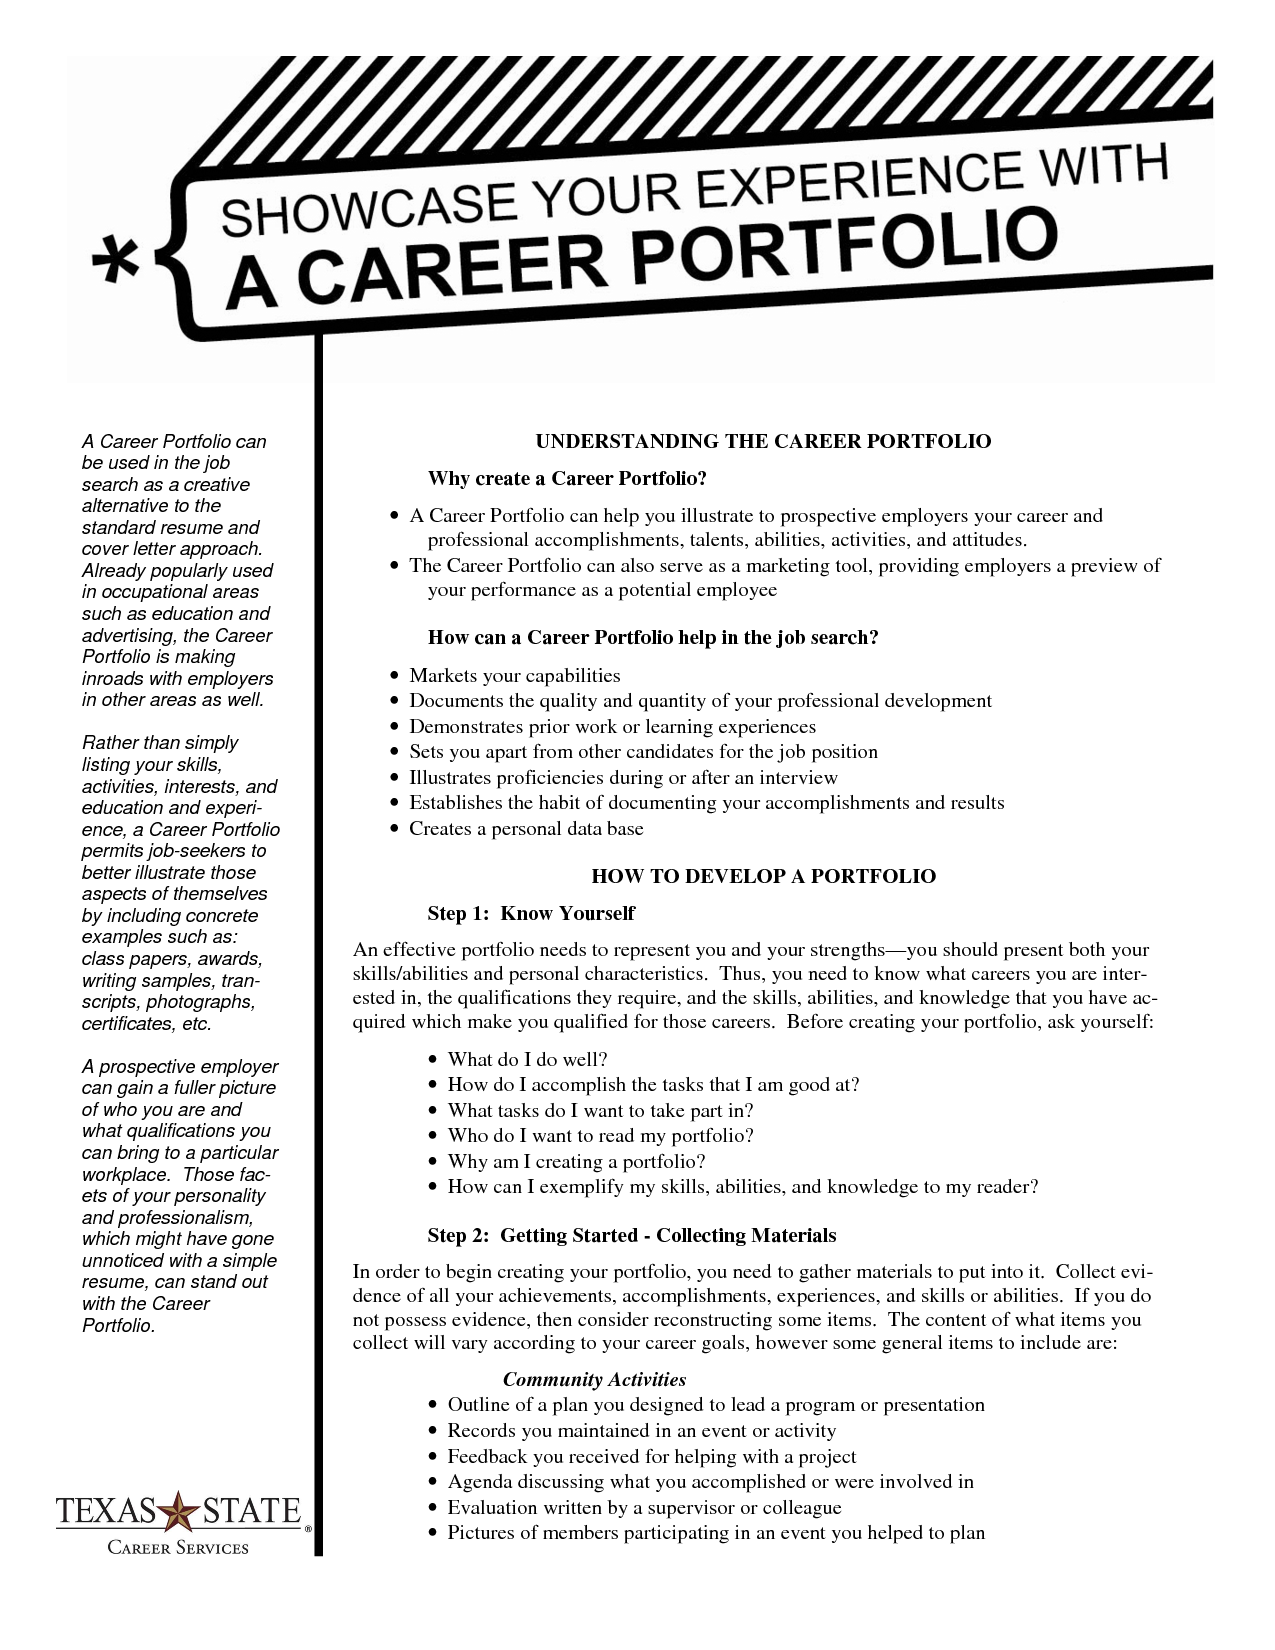 Sample Of Portfolio Outline